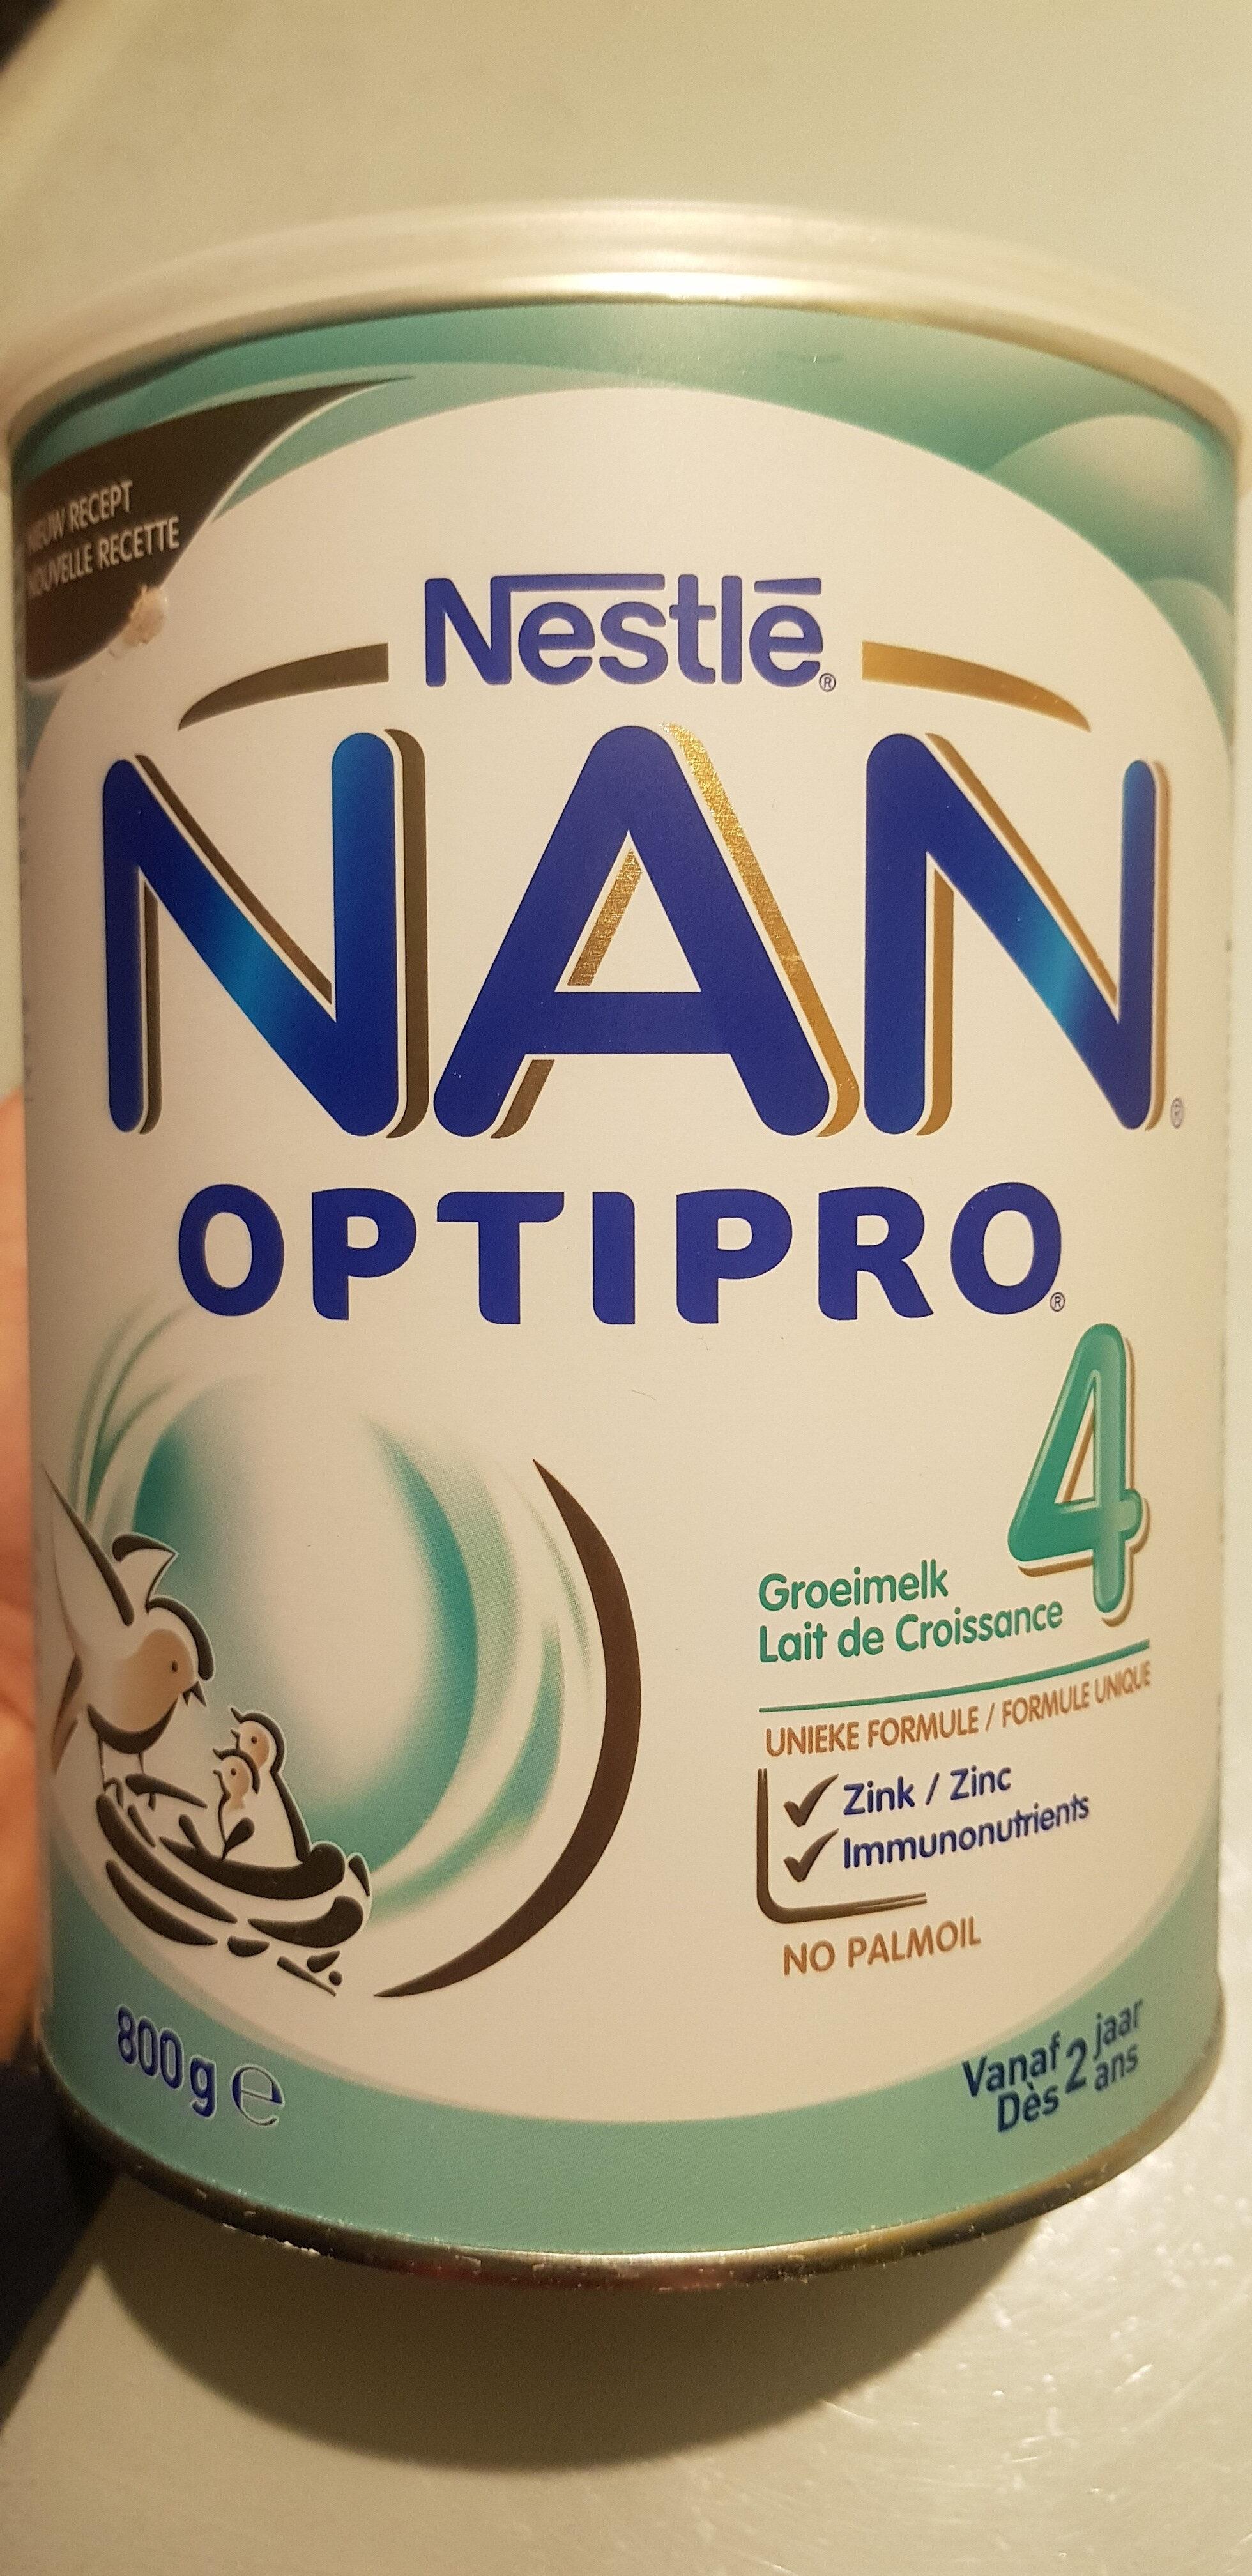 NAN OPTIPRO 4 - Product - fr